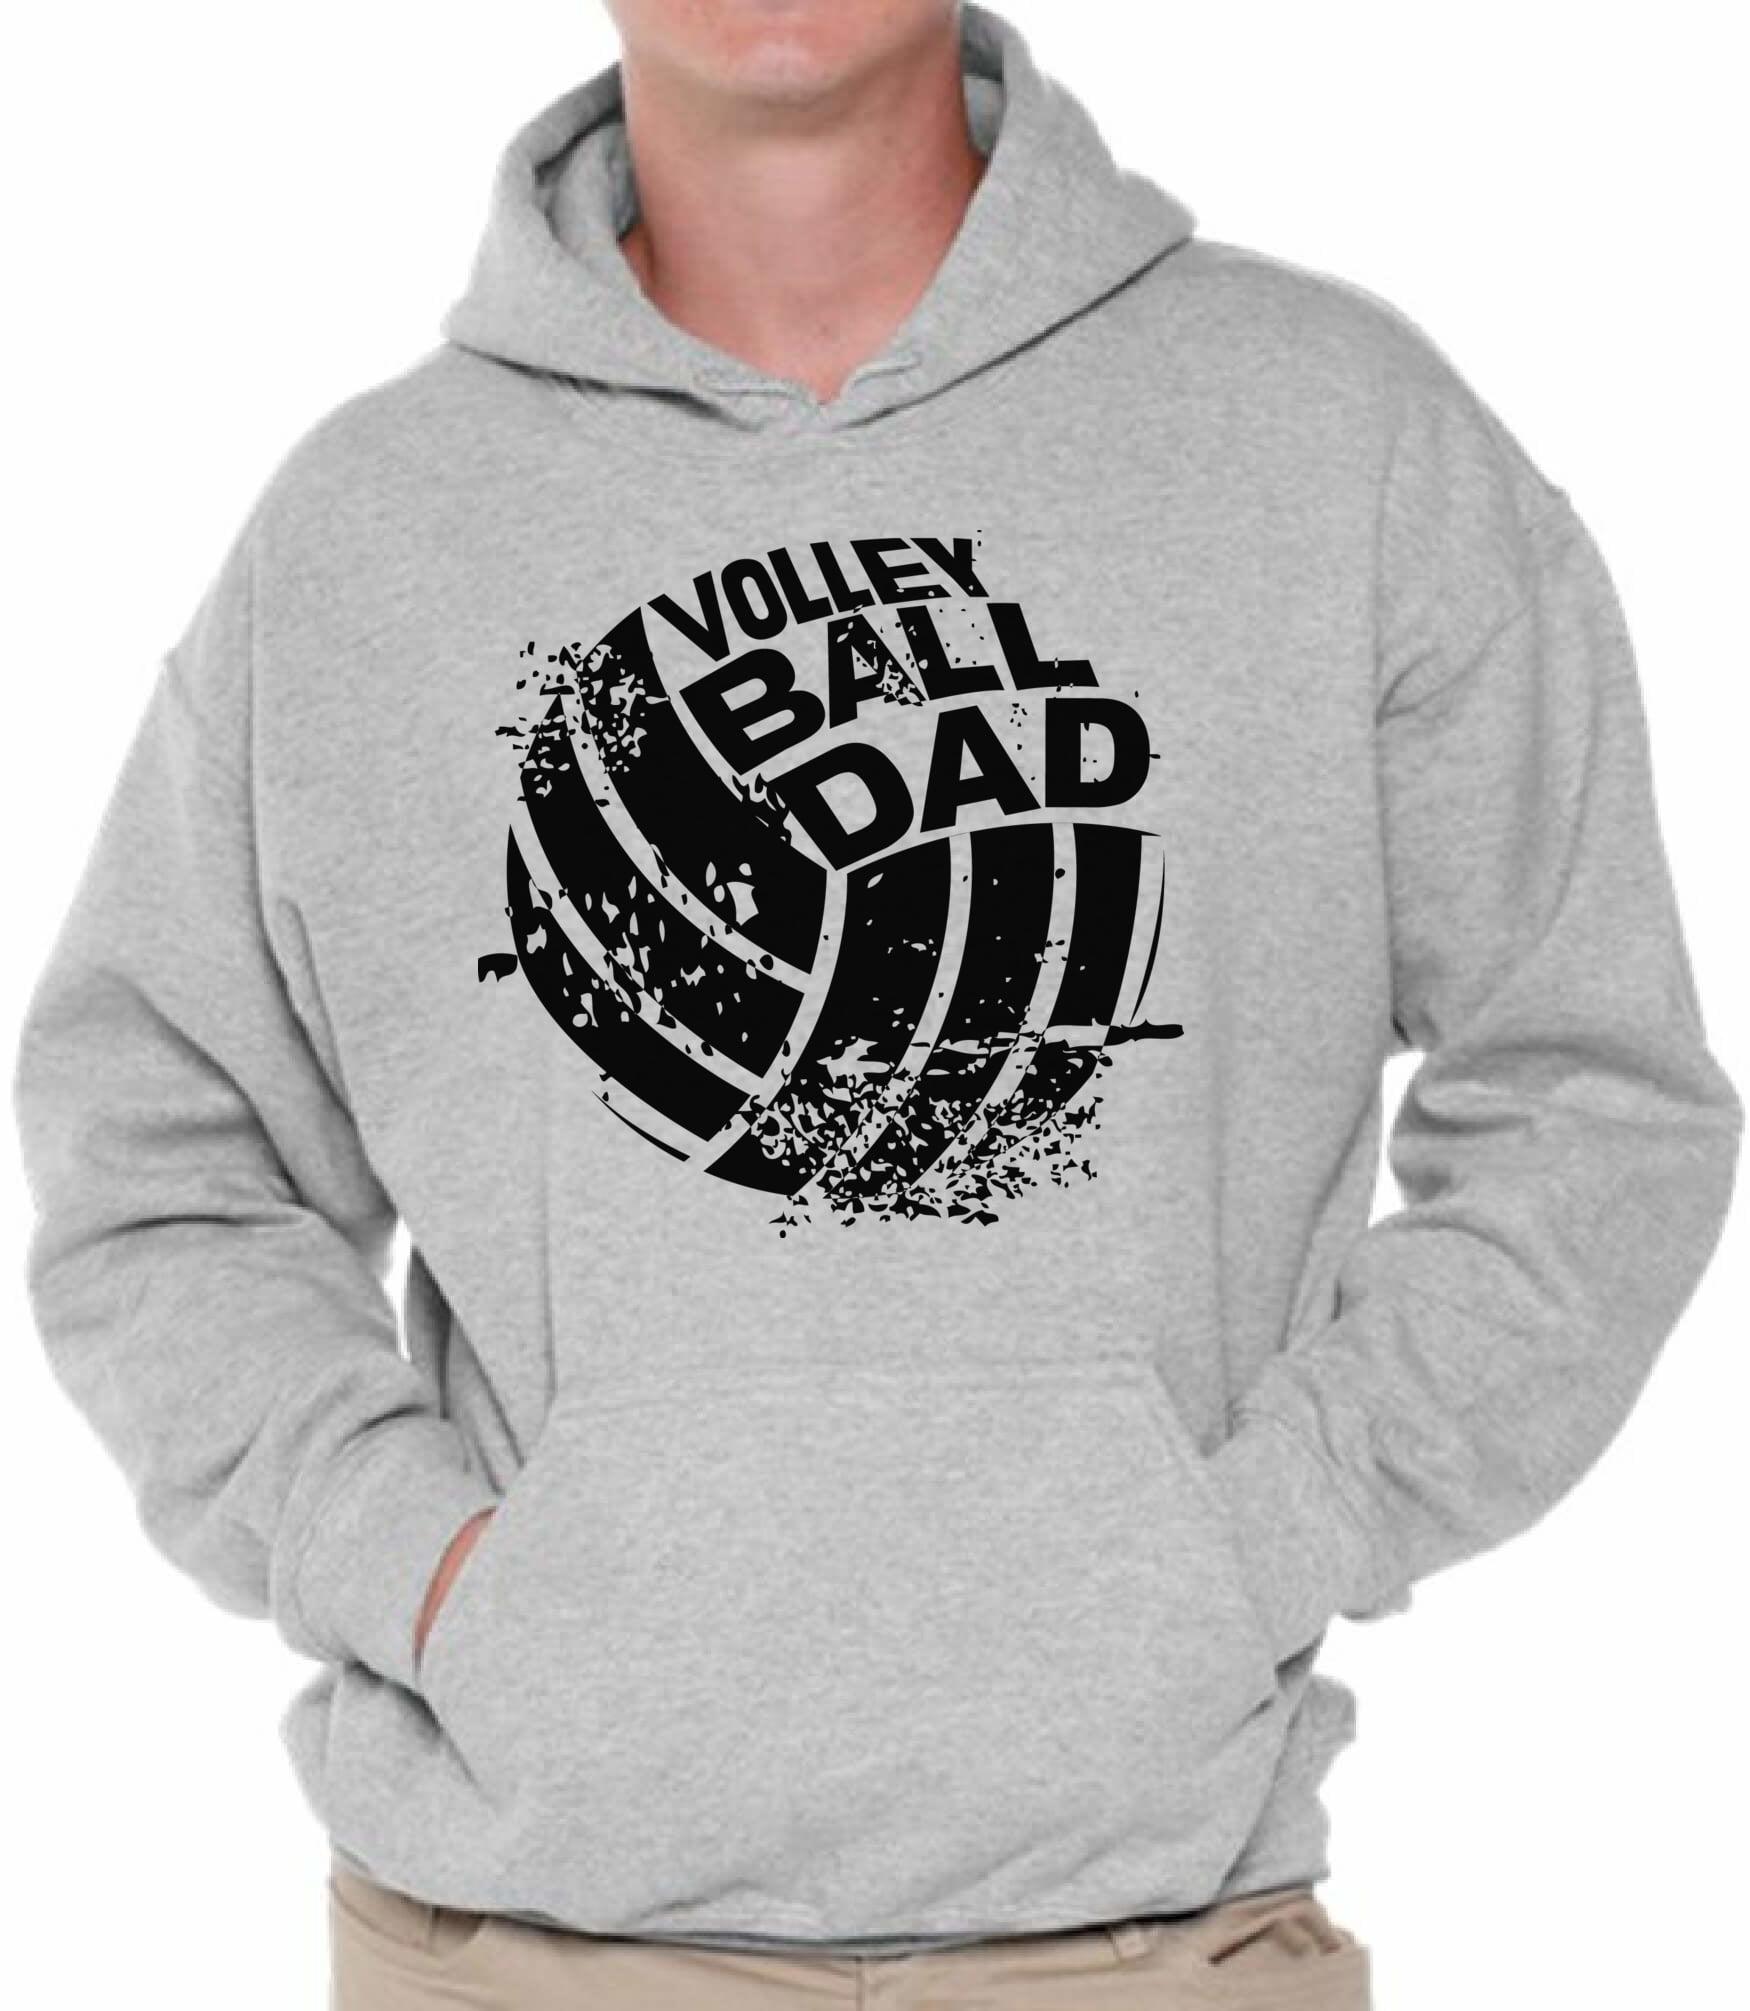 Zip Up Hoodie Softball Dad Fan Father Hooded Sweatshirt for Men